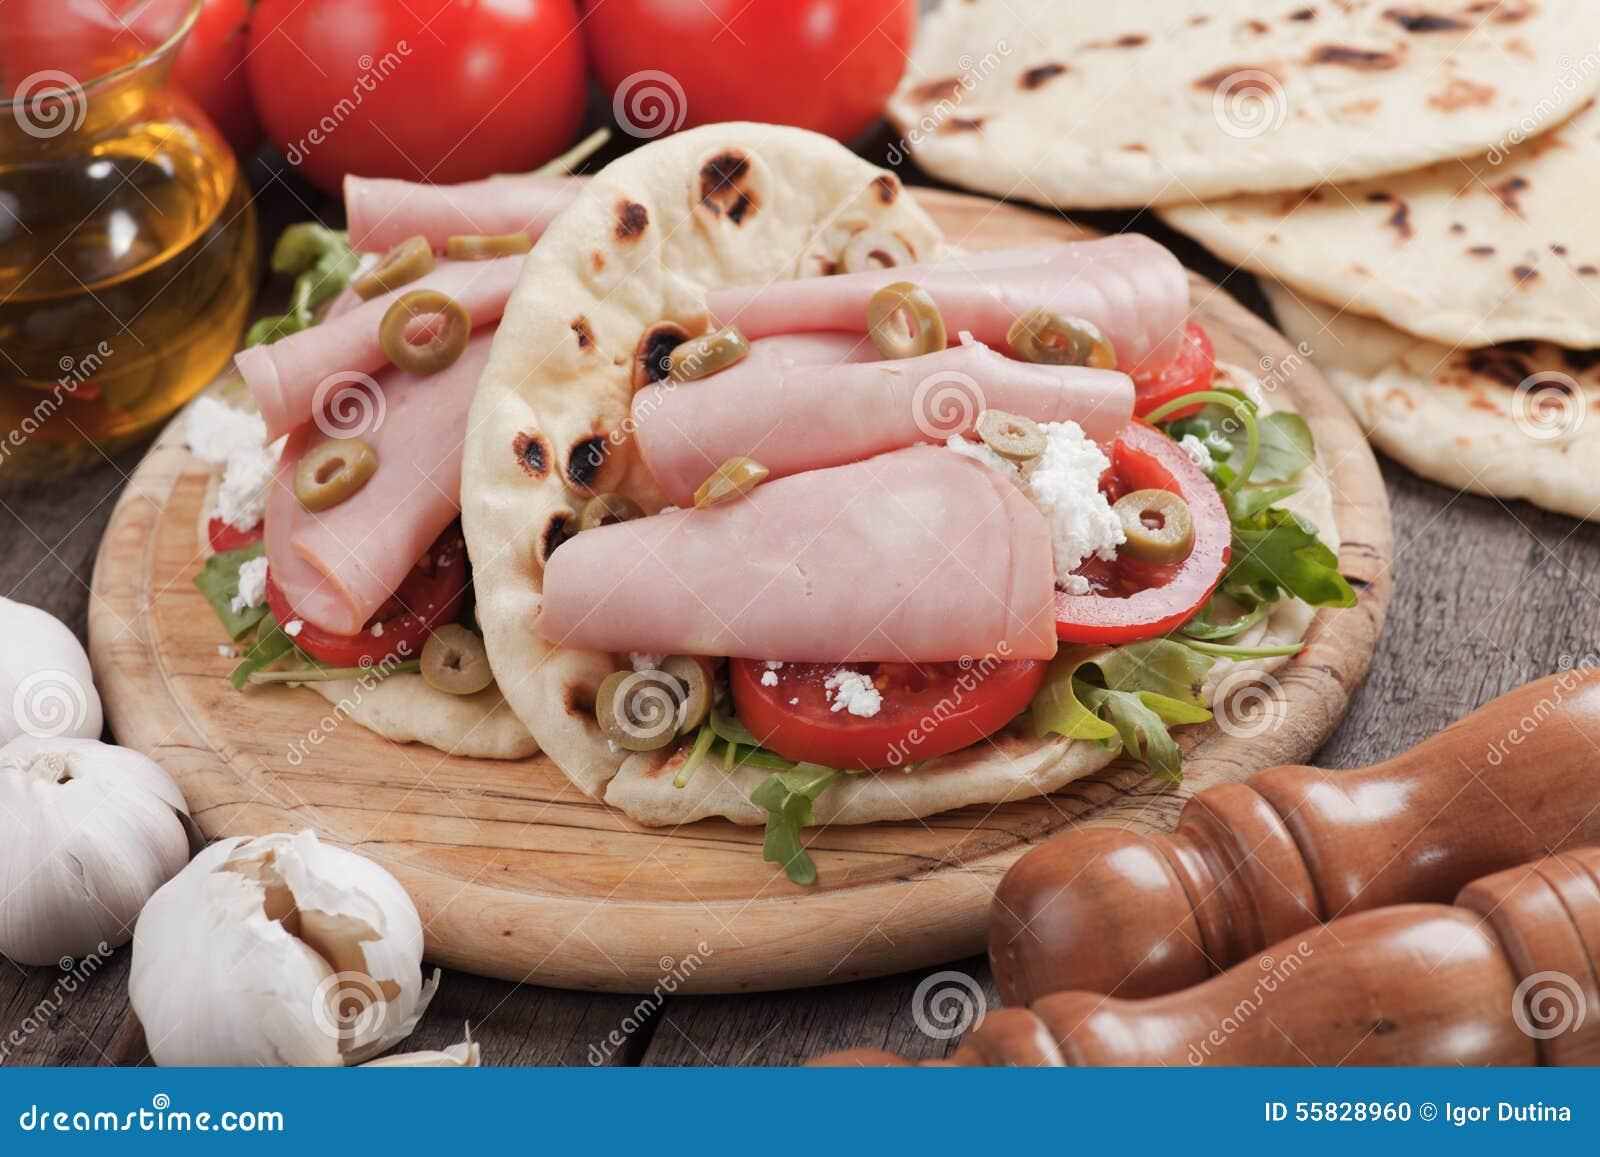 Piadina romagnola, włoska flatbread kanapka